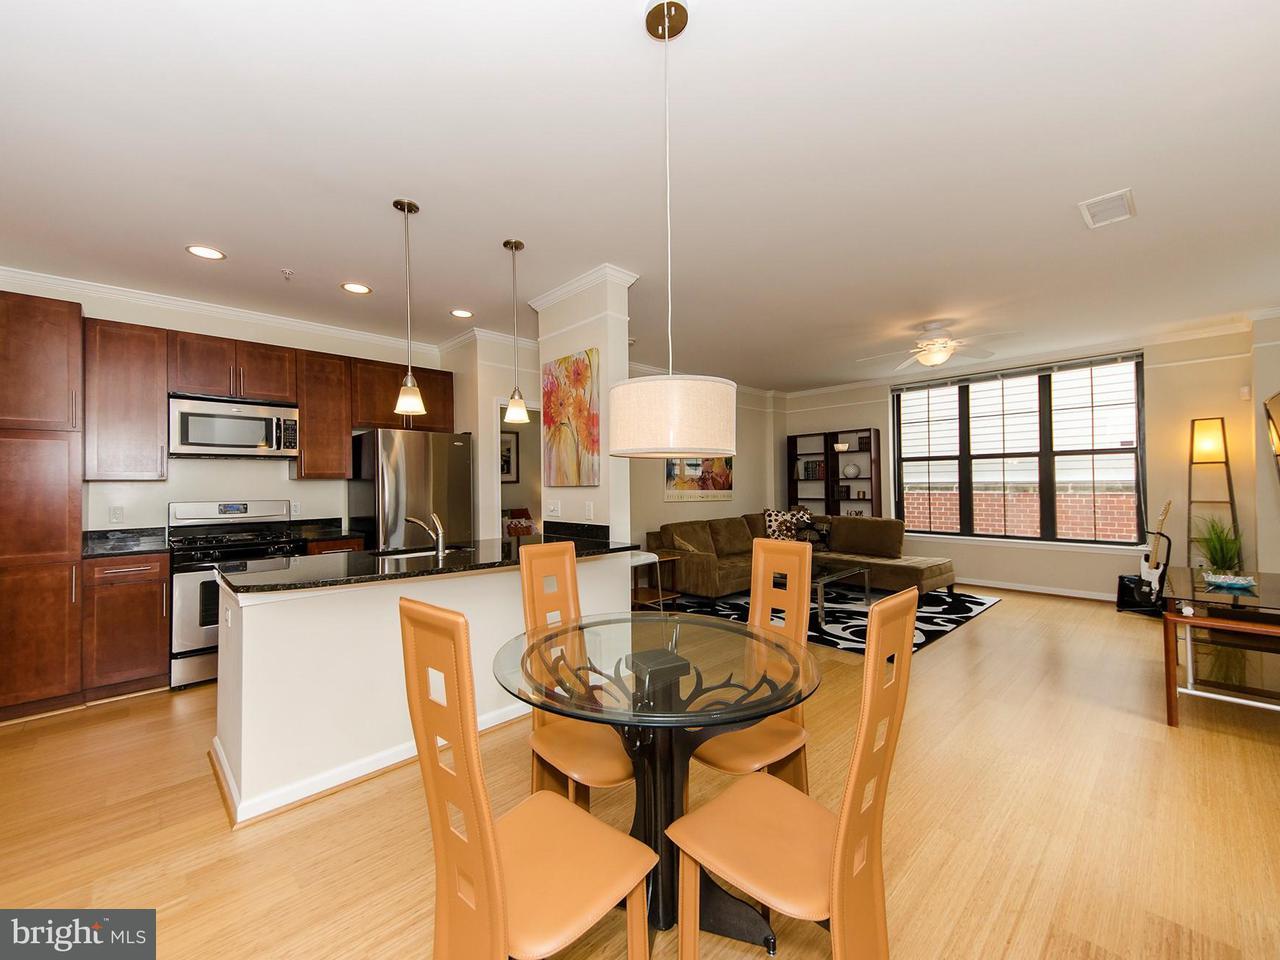 Additional photo for property listing at 444 Broad St W #308 444 Broad St W #308 Falls Church, Виргиния 22046 Соединенные Штаты